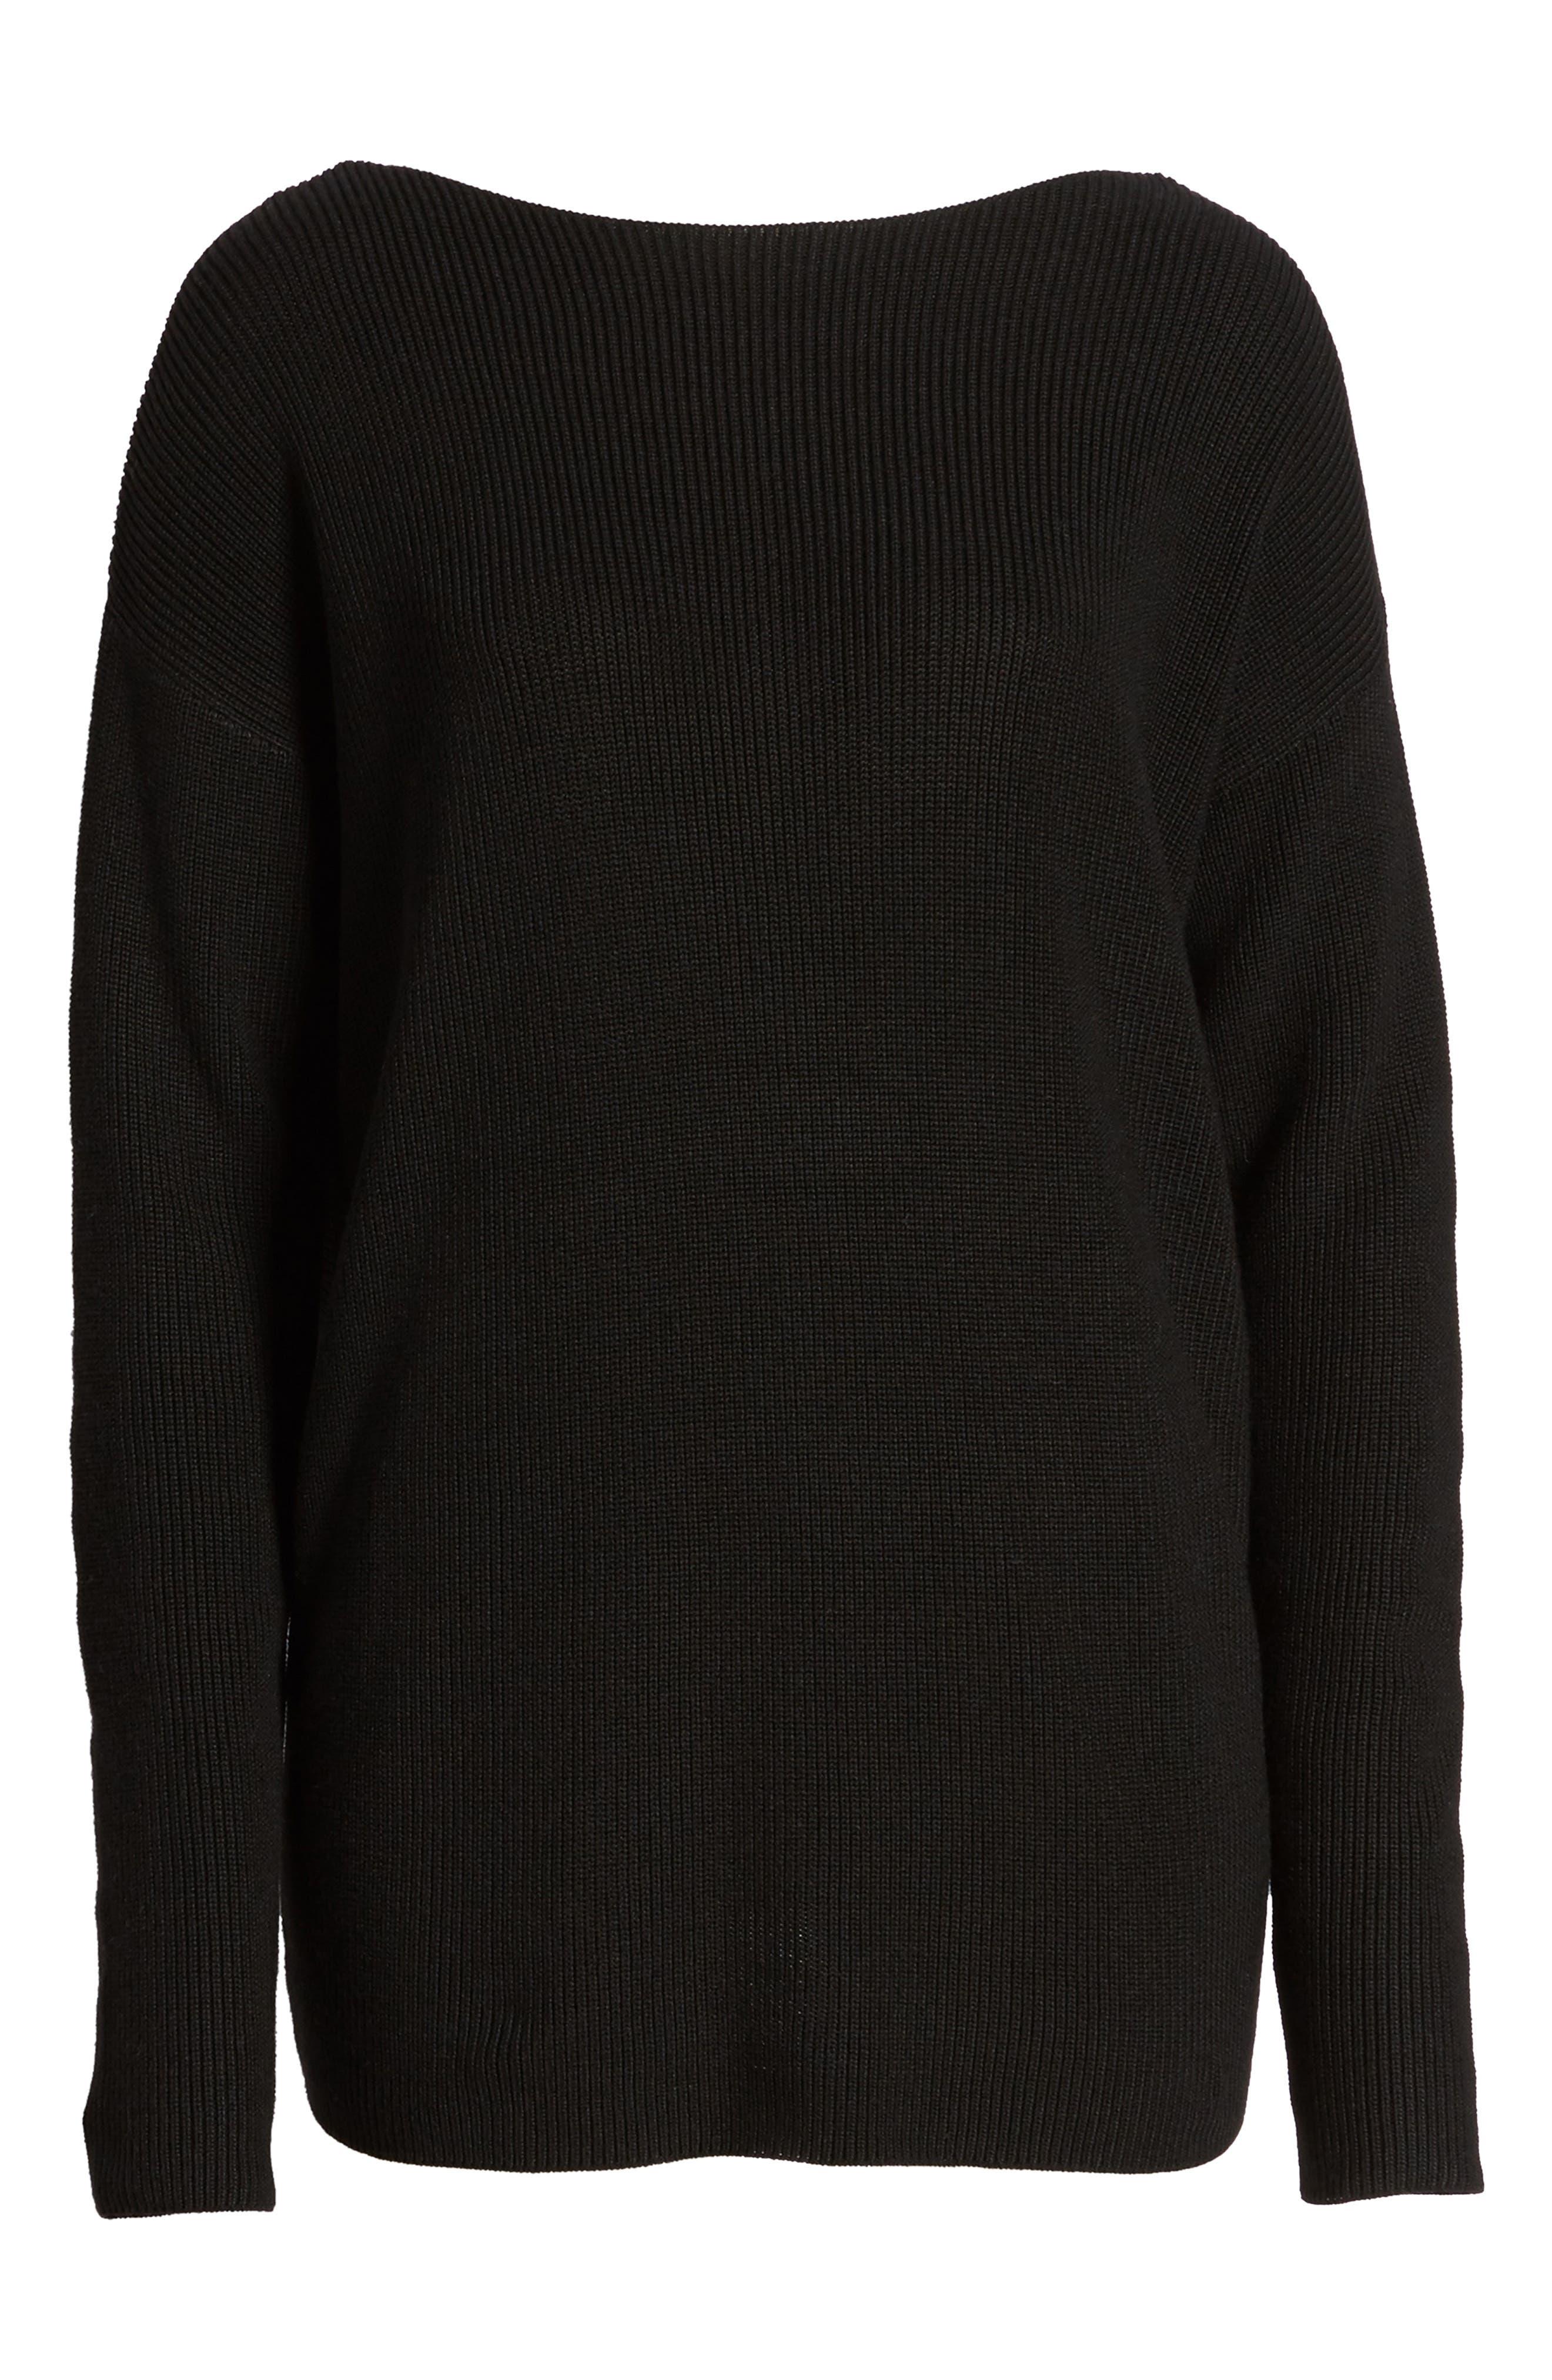 Twist Back Sweater,                             Alternate thumbnail 6, color,                             001